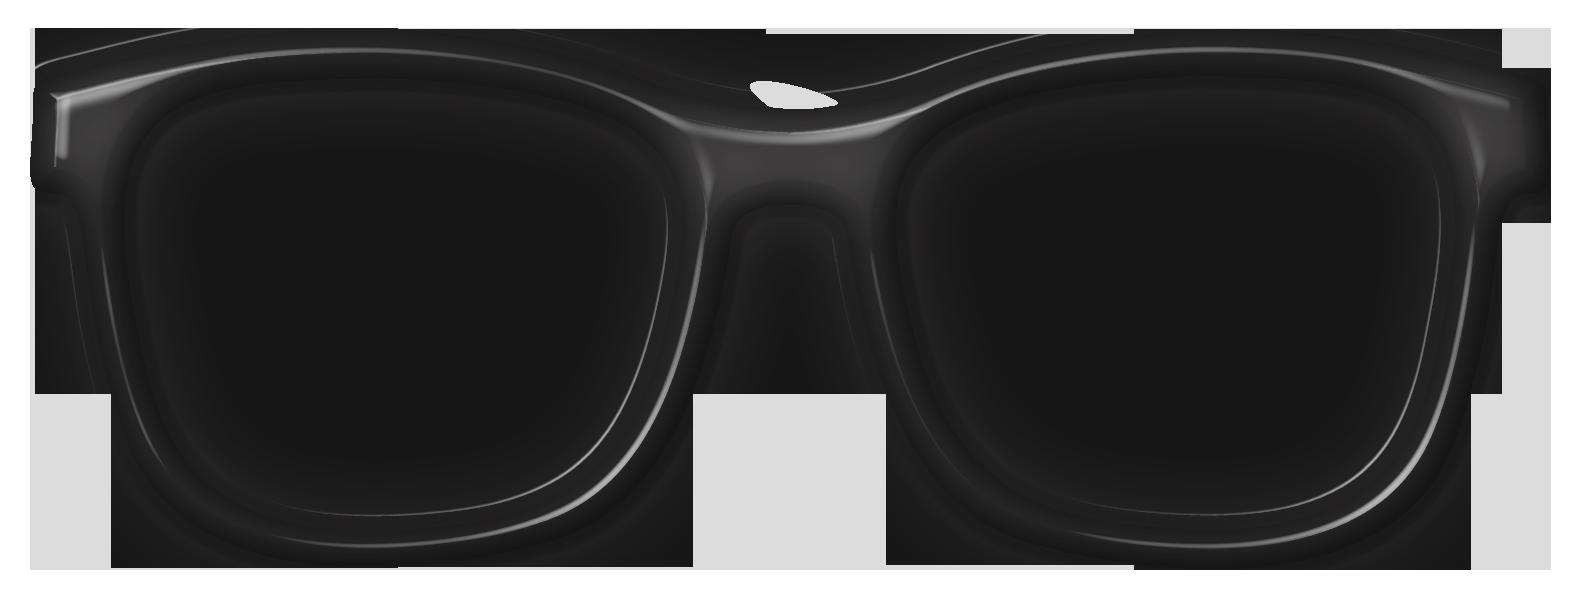 Glasses Transparent Clipart.